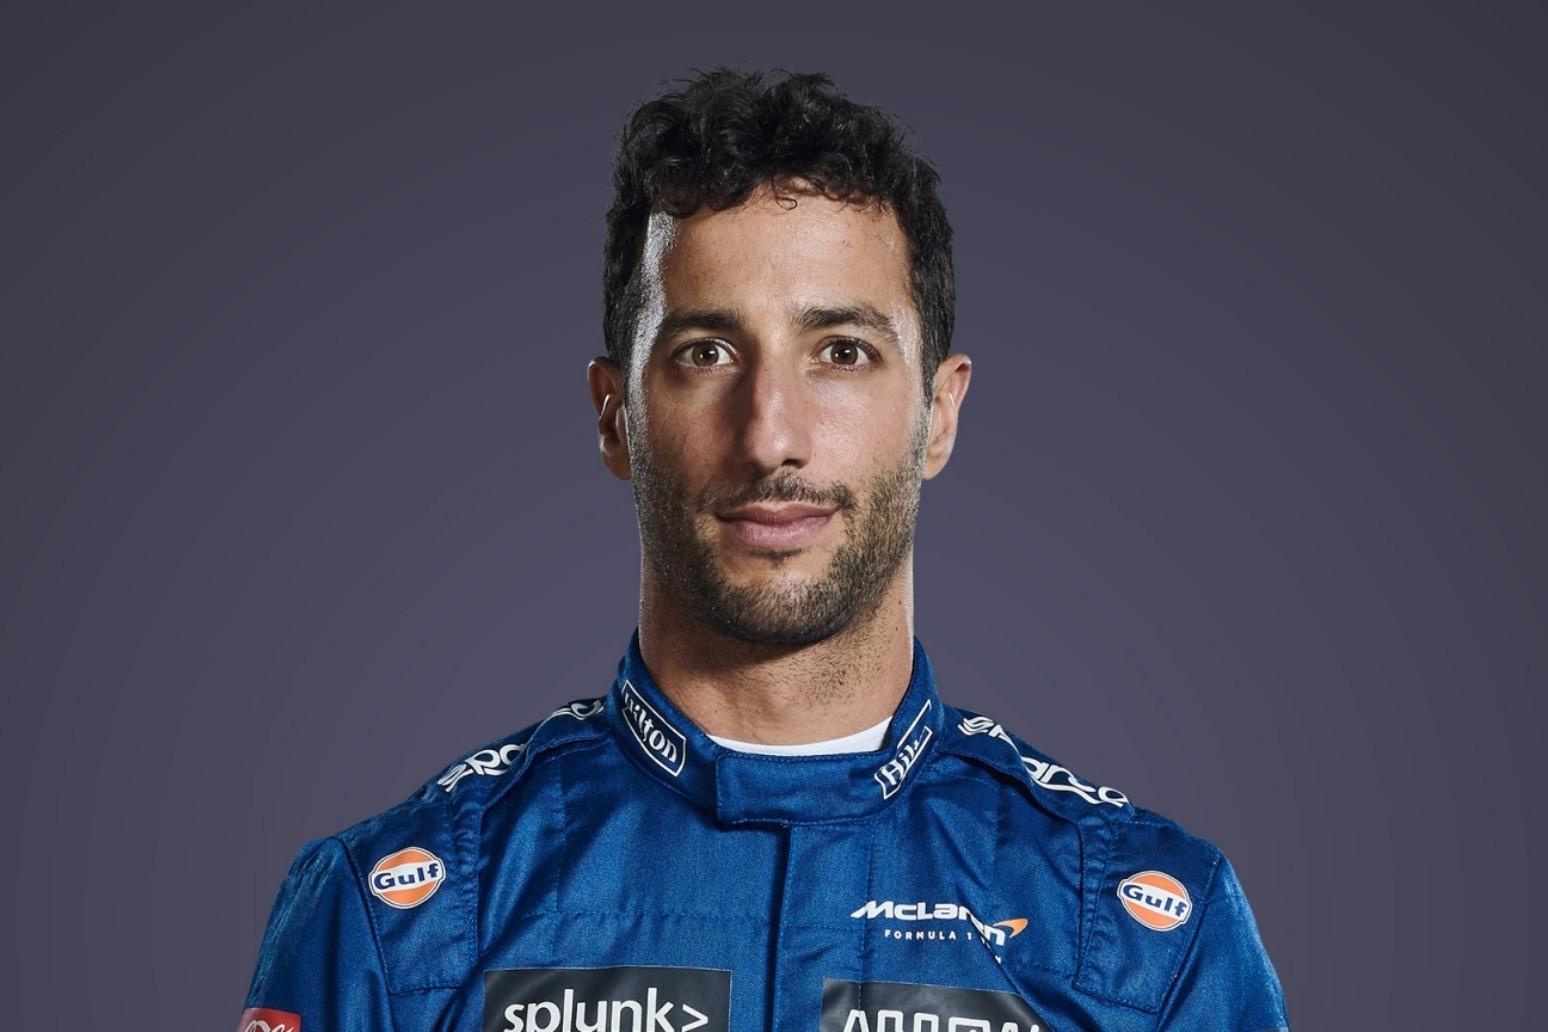 Daniel Ricciardo wins at Monza thumbnail